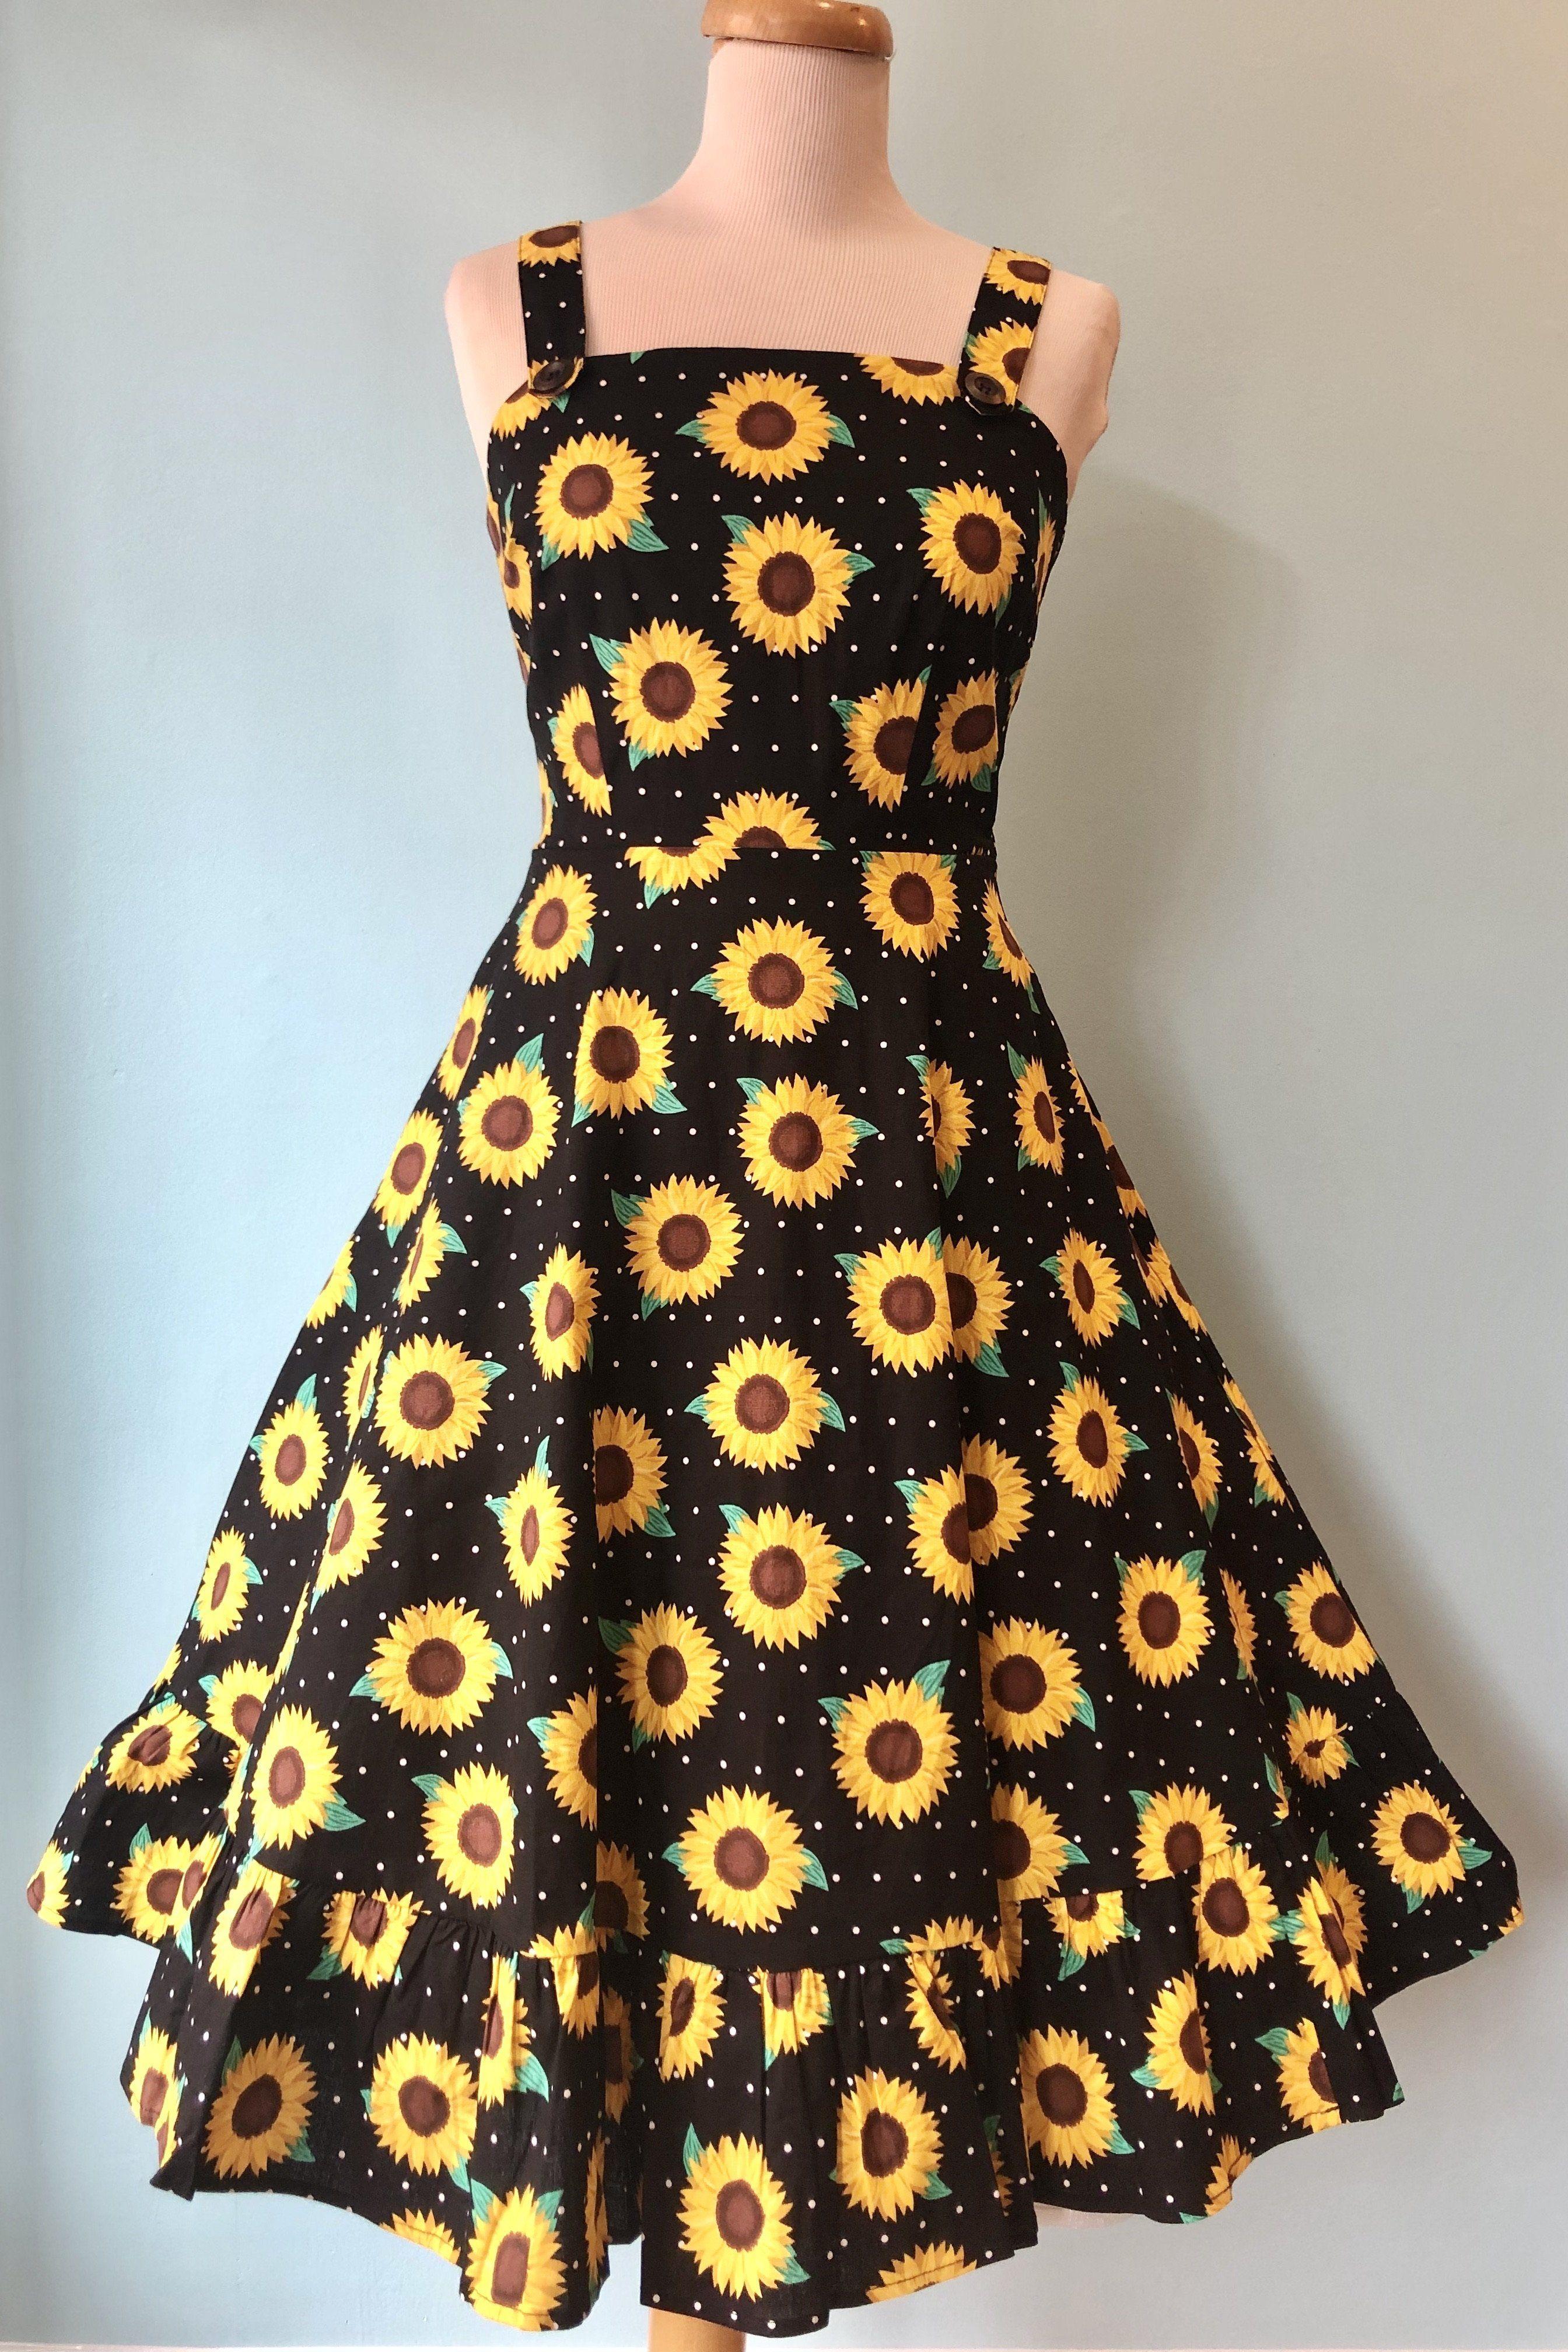 Maggie Sunflower Dress By Collectif Modern Millie Shop Dresses Sunflower Dress Cute Dresses [ 4032 x 2688 Pixel ]